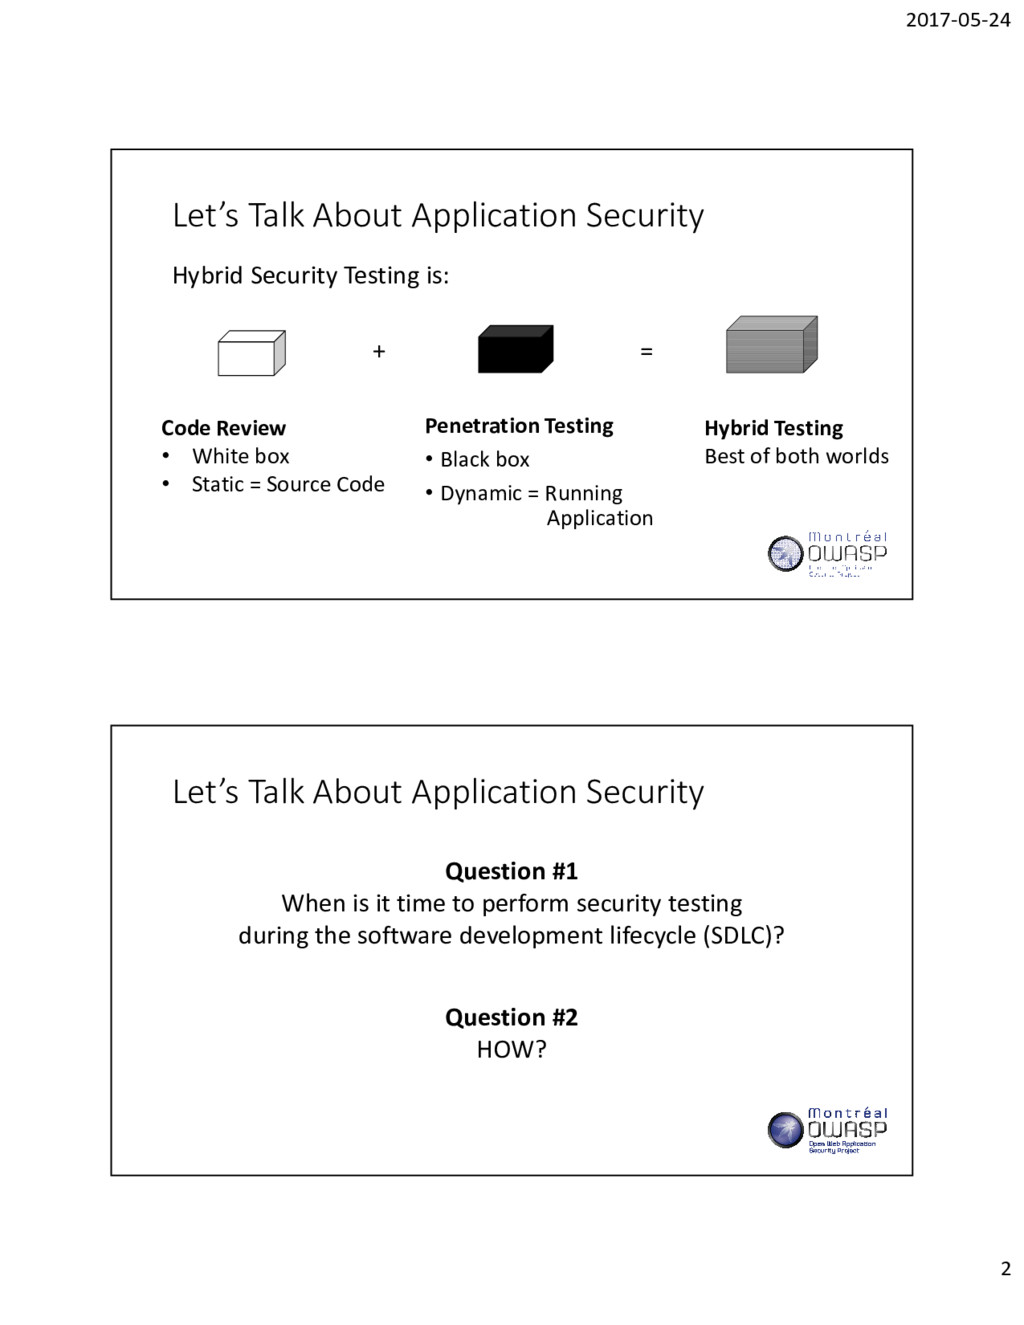 2017-05-24 2 Let's Talk About Application Secur...